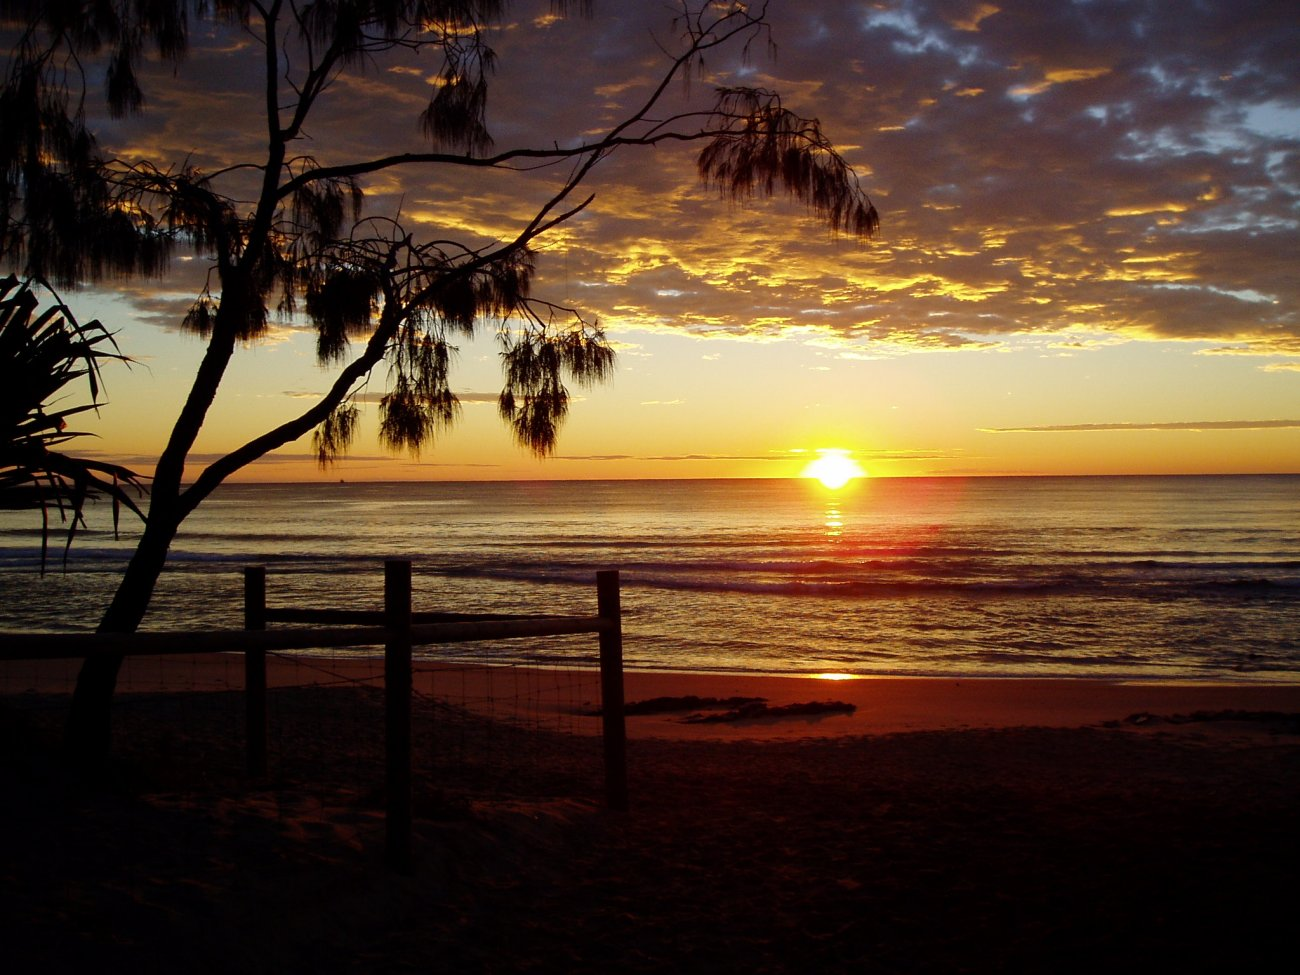 http://4.bp.blogspot.com/-Qque_z6BK-4/T_djtKXpUhI/AAAAAAAAAm8/Im04KsWnVek/s1600/sunrise_sunshine_coast_australia.jpg